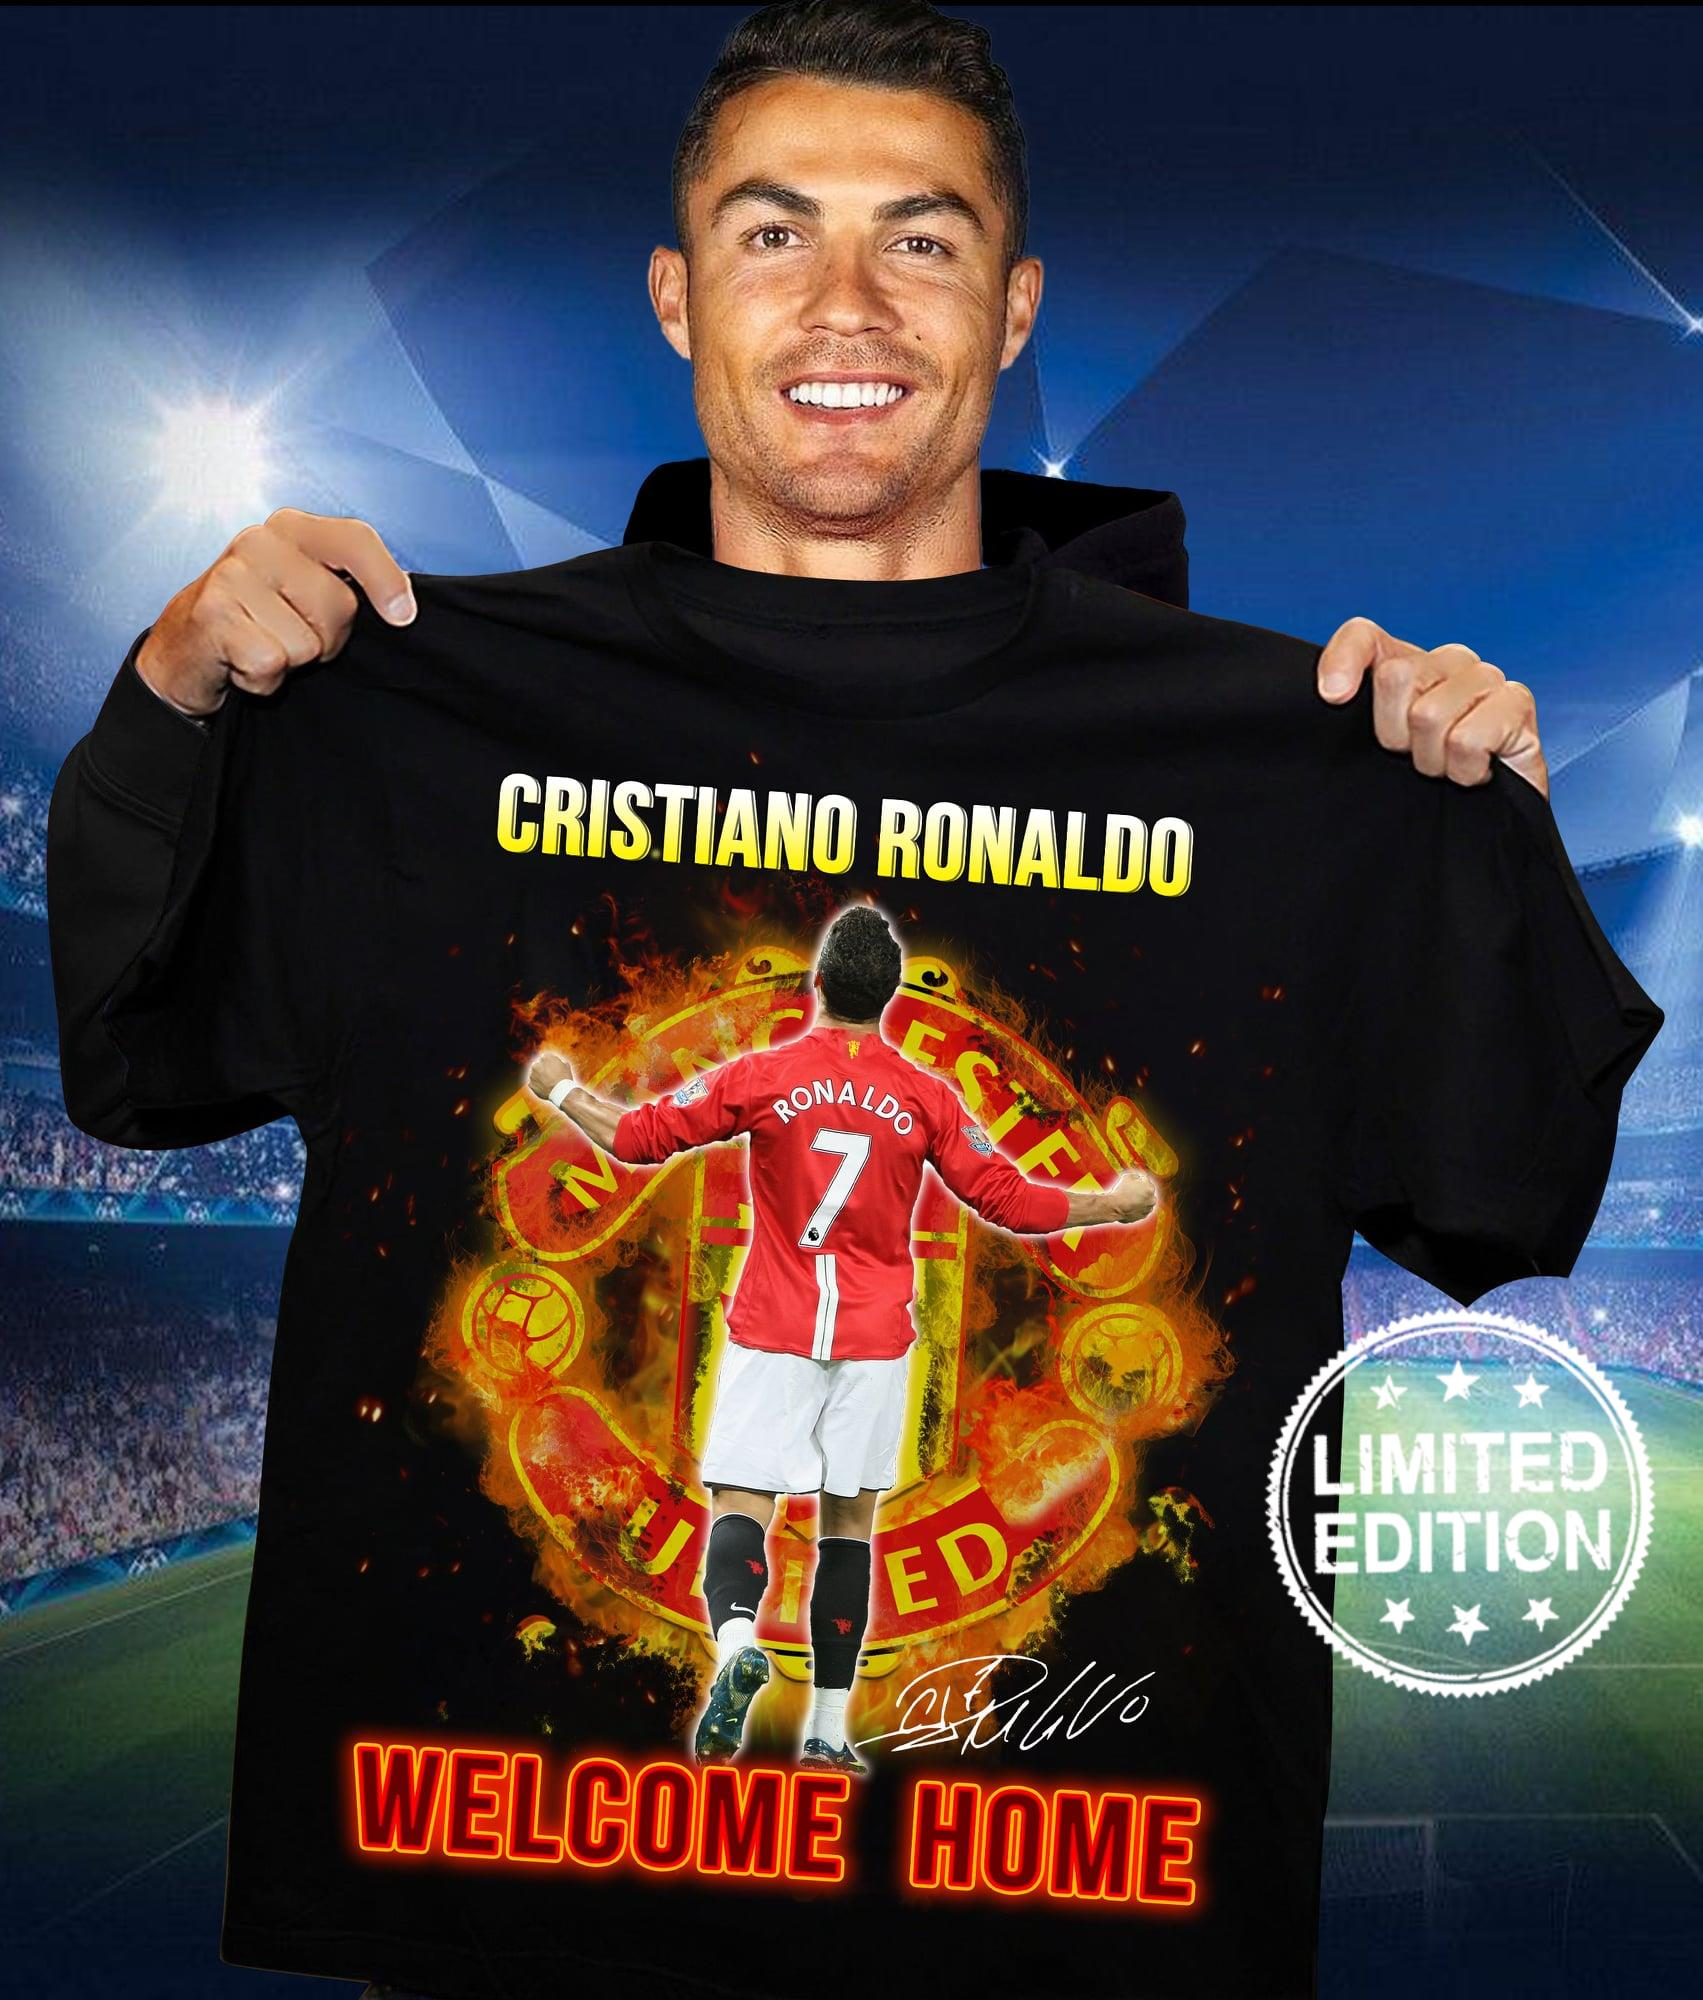 Cristiano ronaldo welcome home shirt